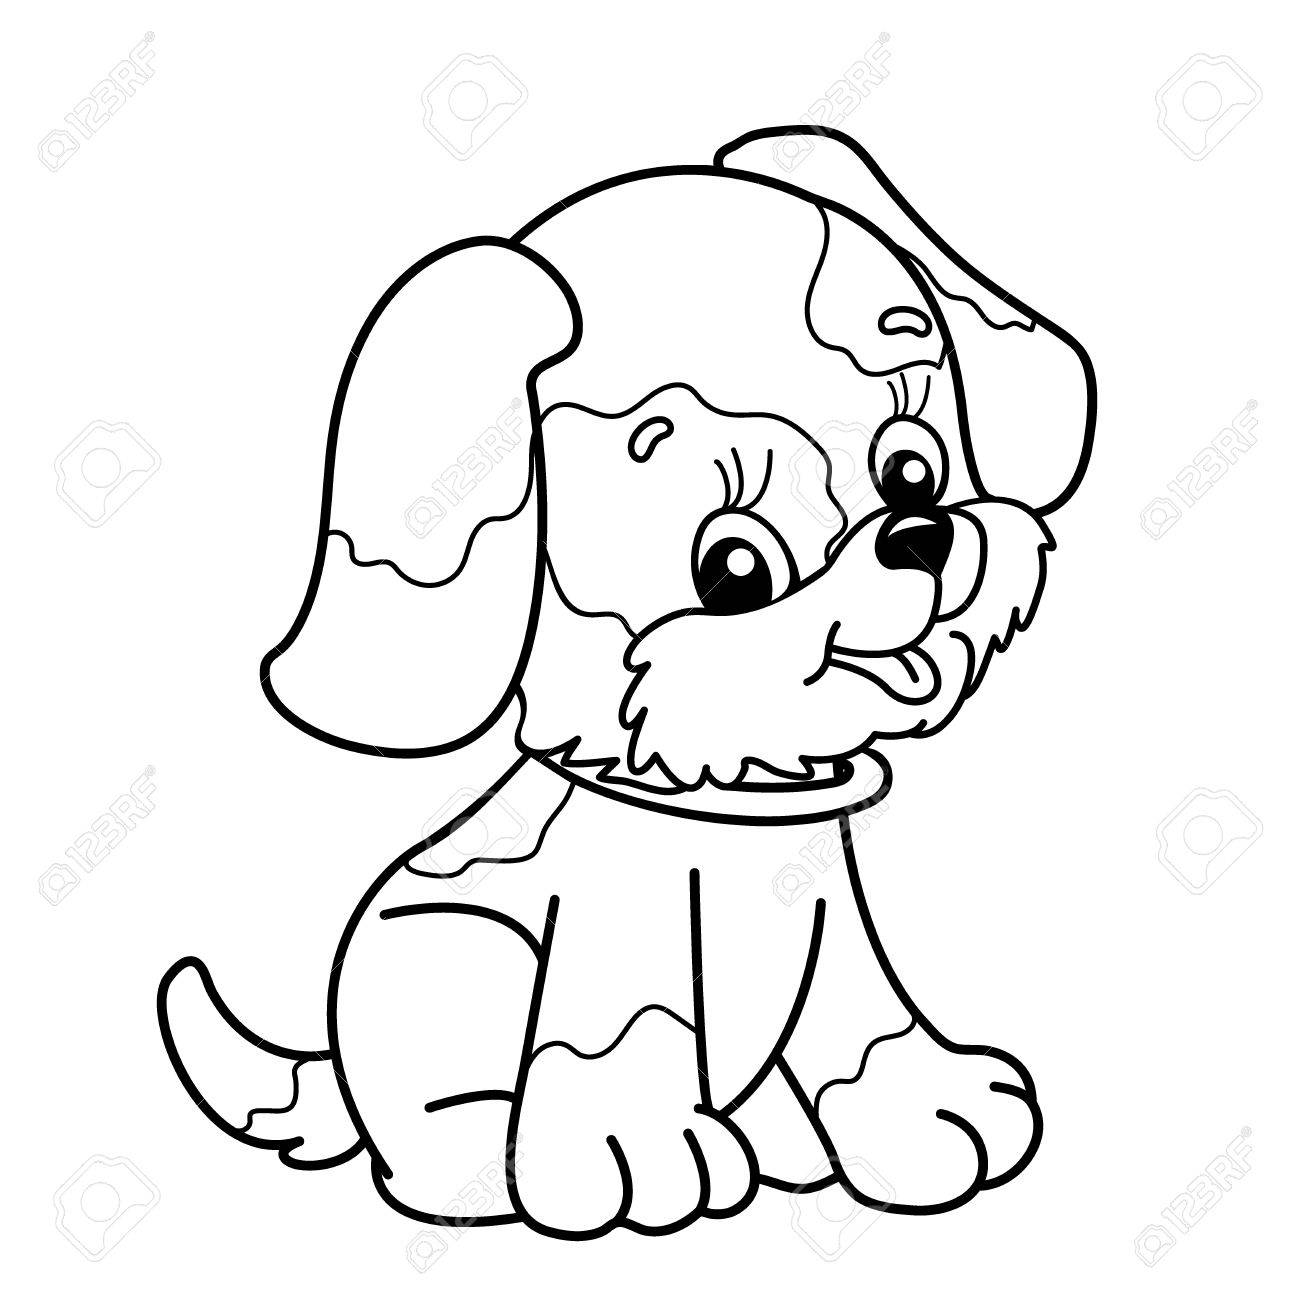 Coloriage De Chien De Compagnie.Coloriage Contour De Chien De Bande Dessinee Cute Puppy Assis